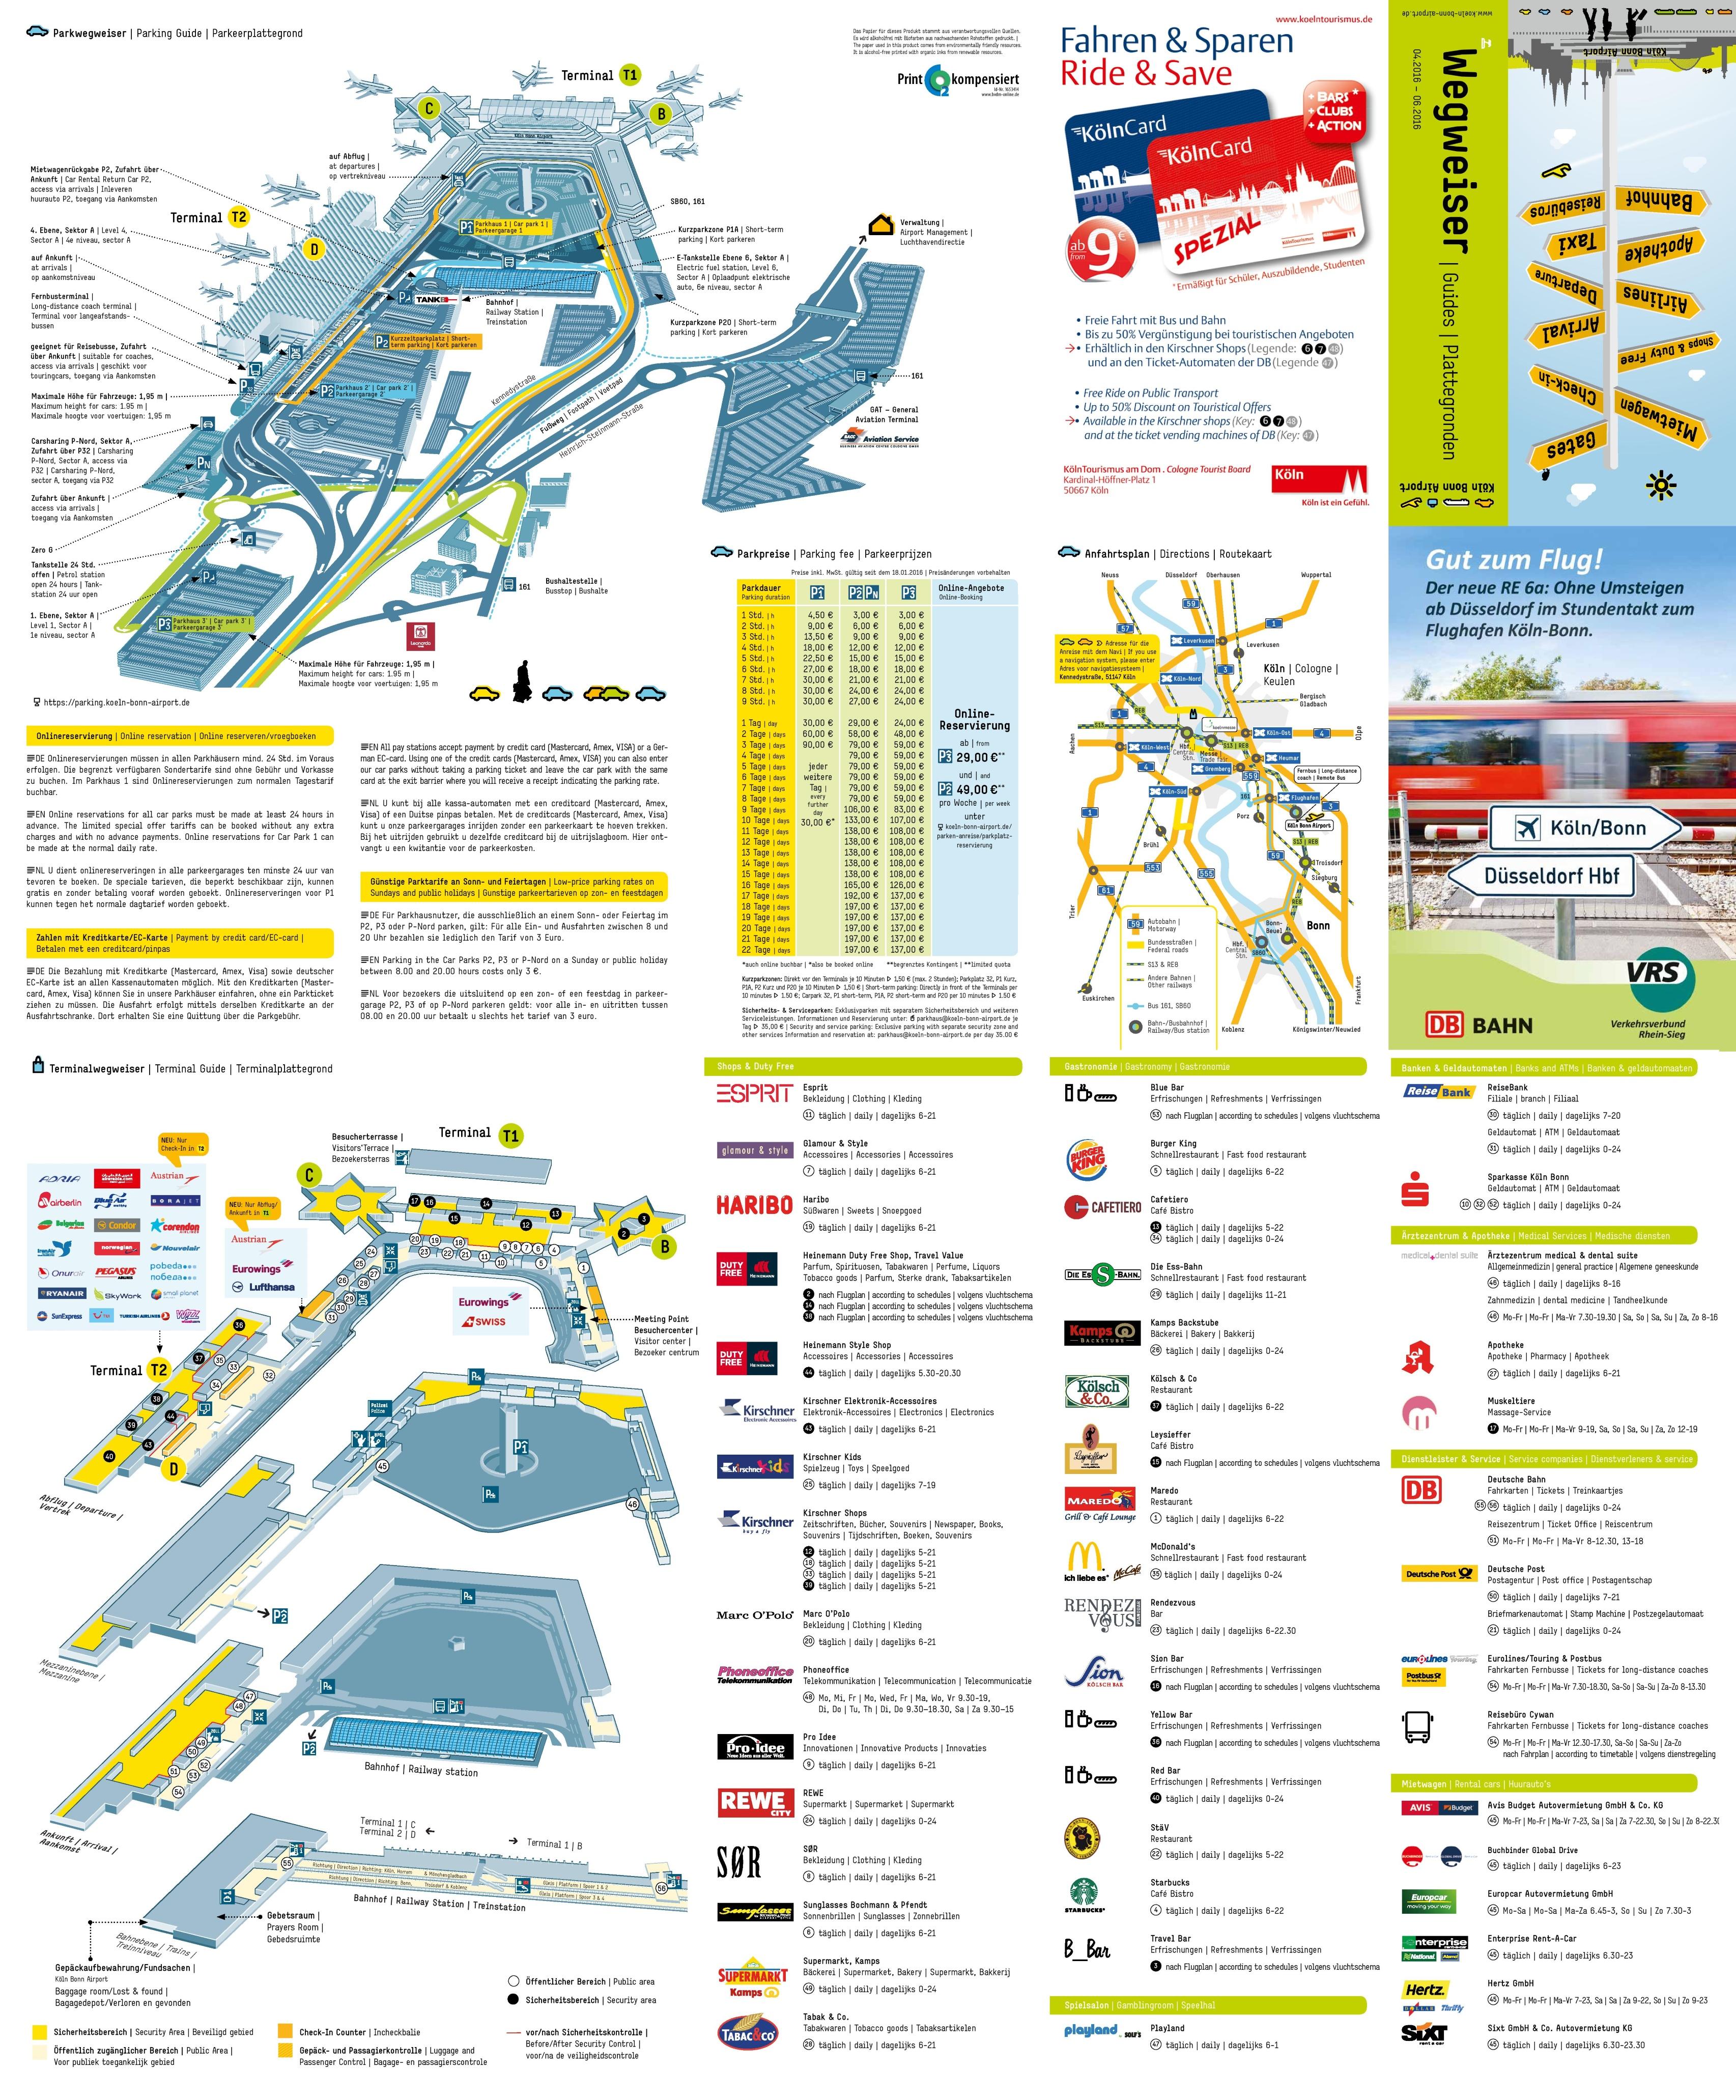 Cologne Bonn airport terminal map